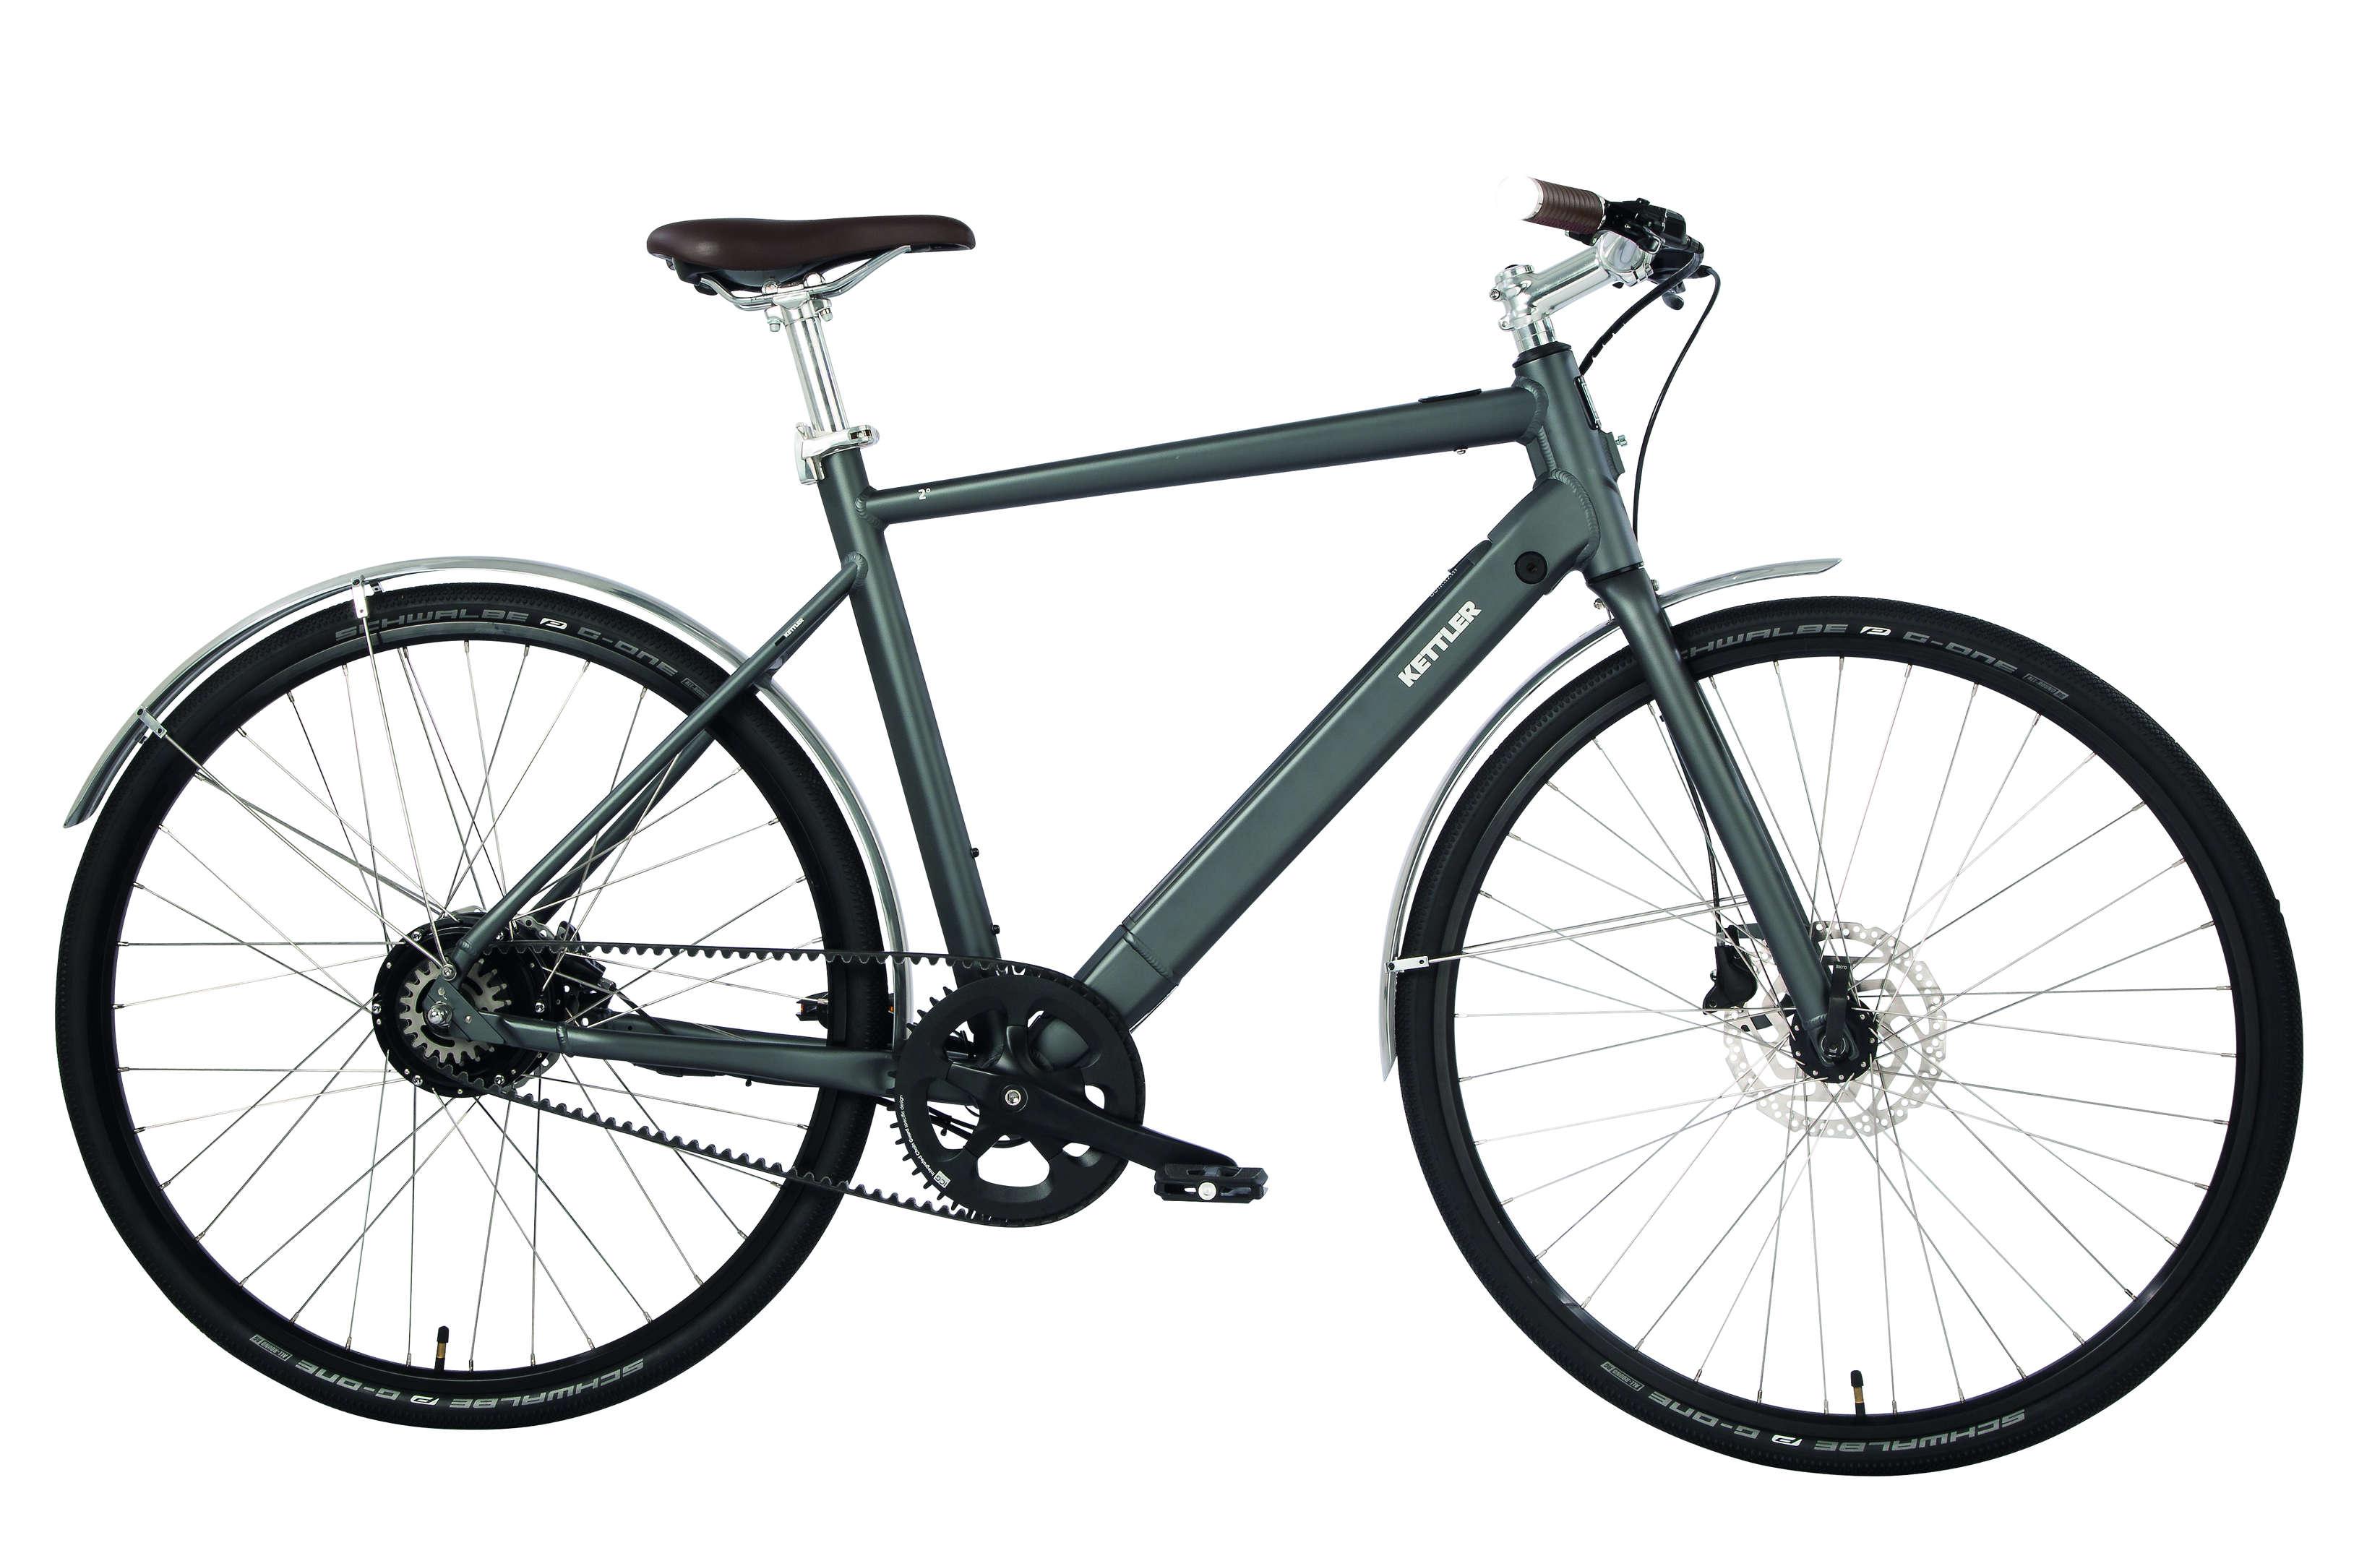 df6f9db7a2fa48 Kettler Alu Rad E Bike 2 E Street Beltdrive Eurorad